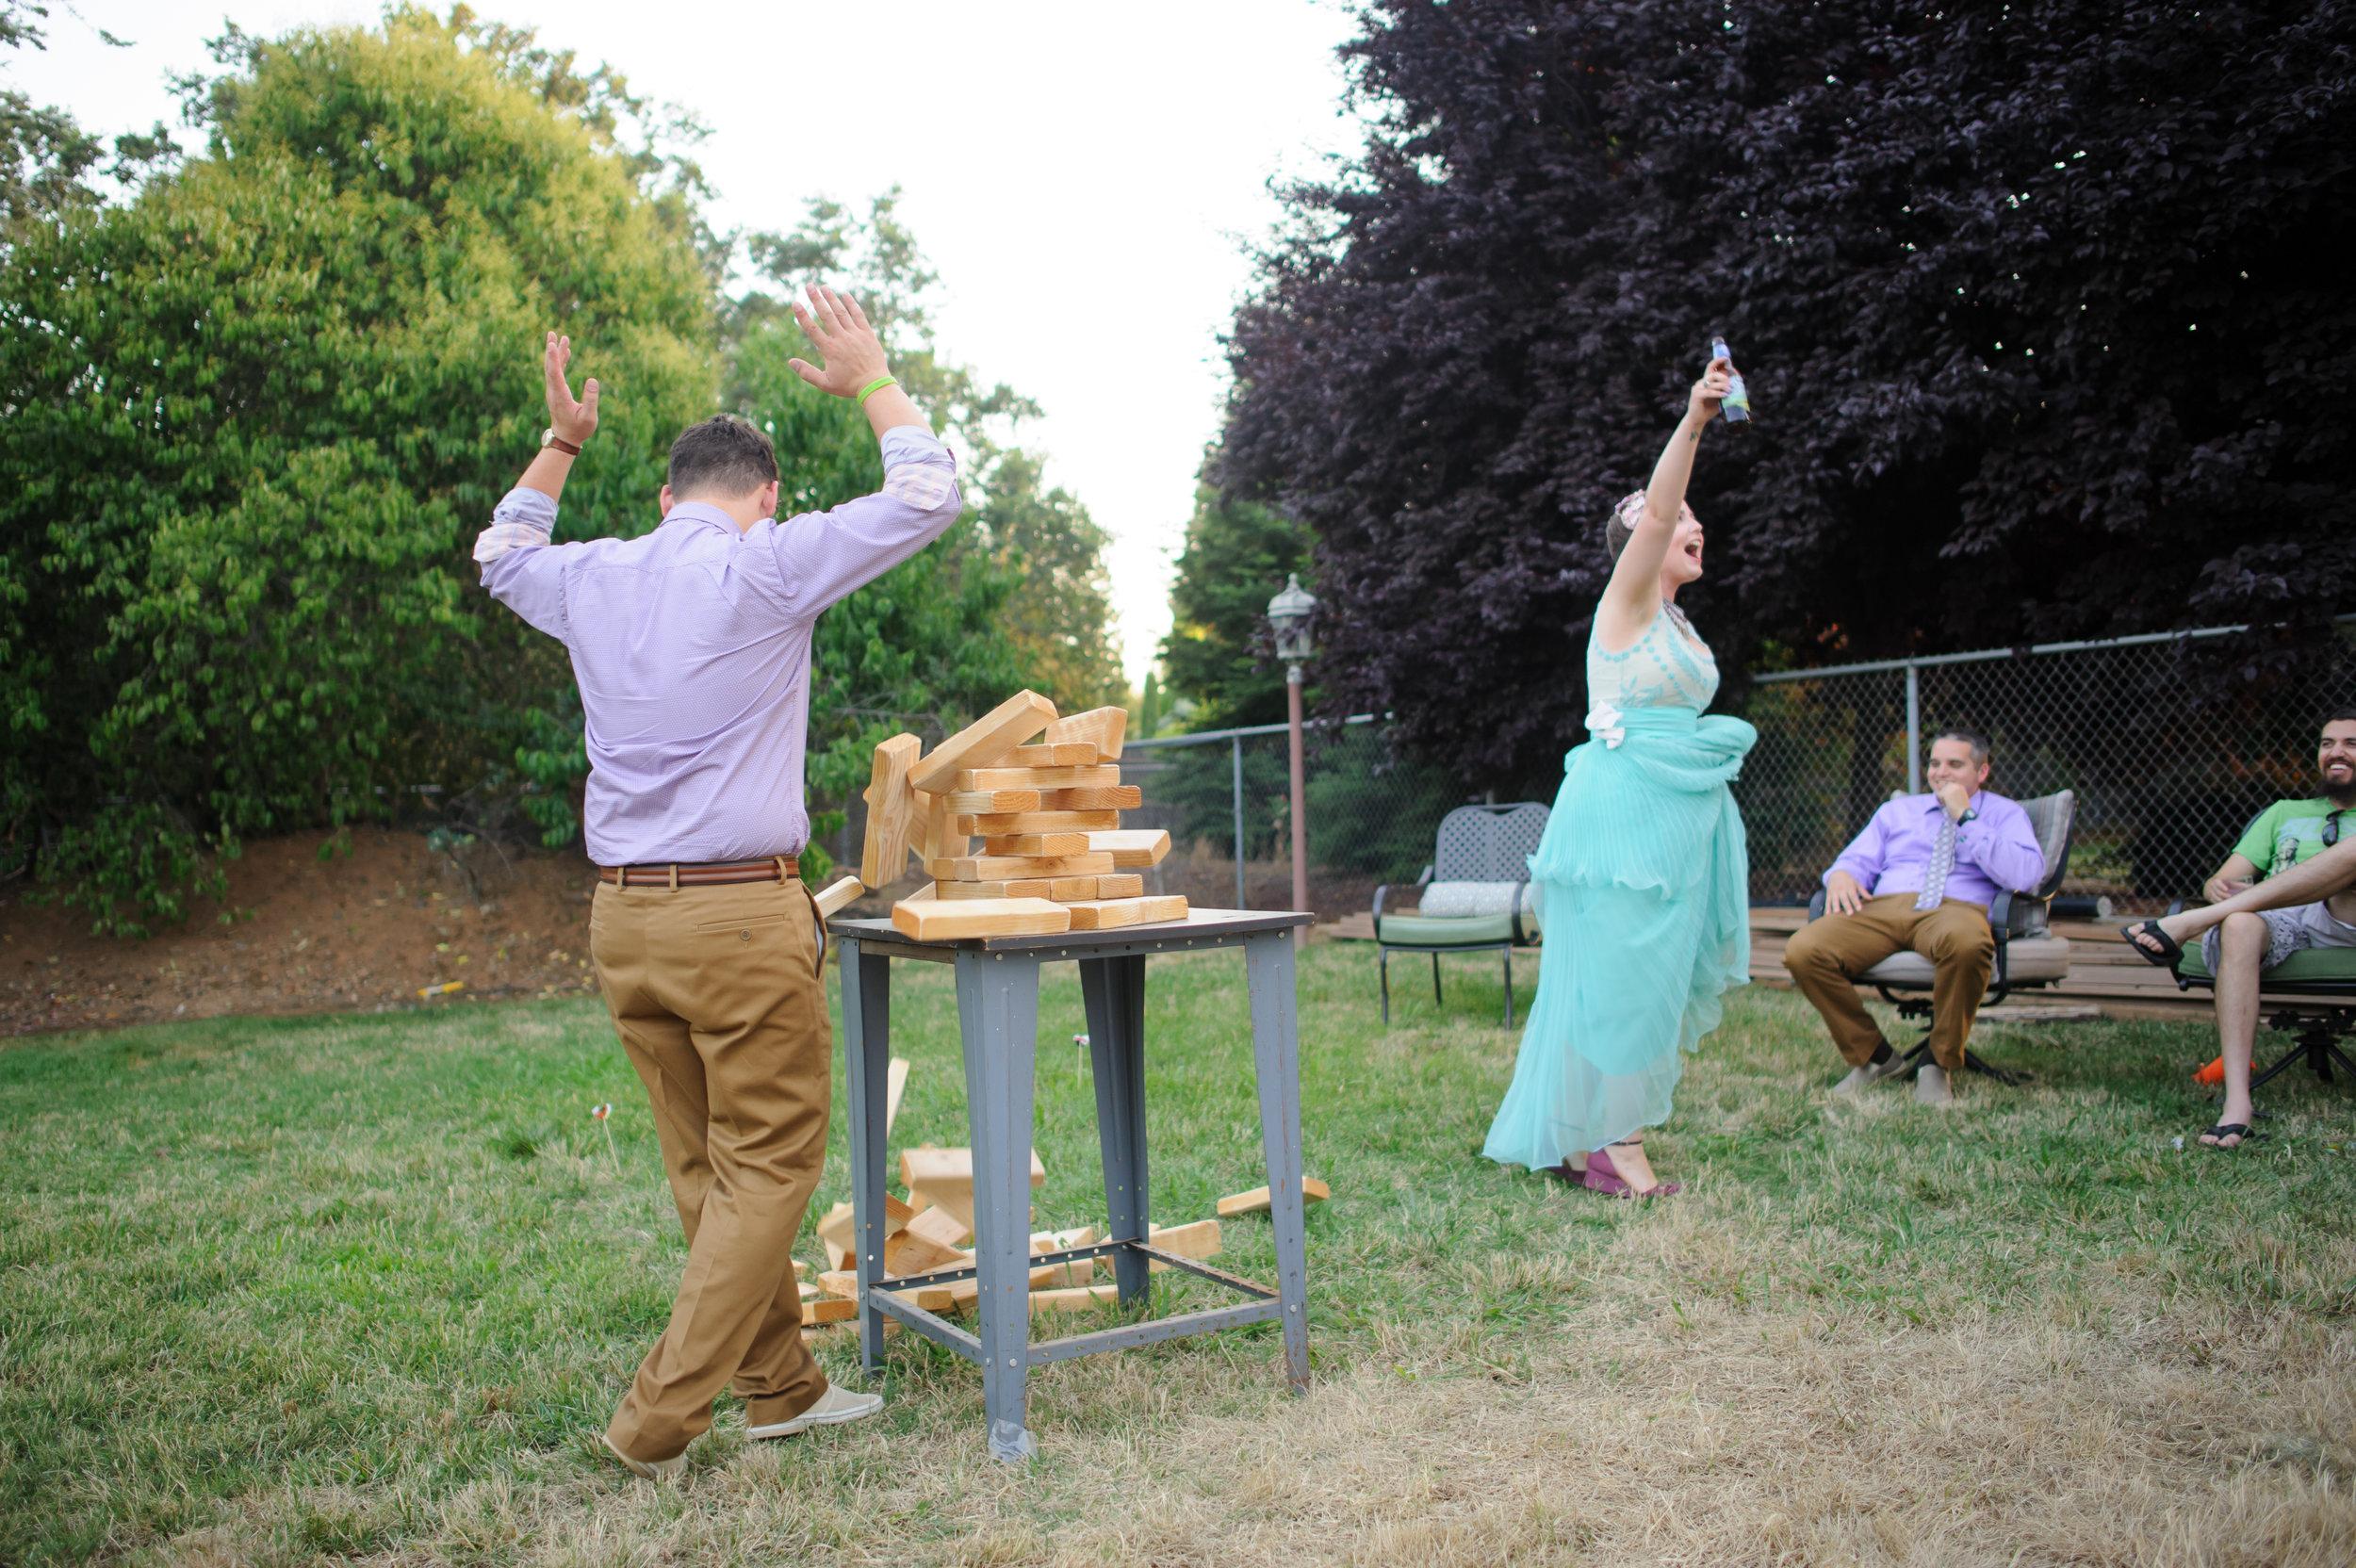 chloe-evan-030-backyard-sacramento-wedding-photographer-katherine-nicole-photography.JPG